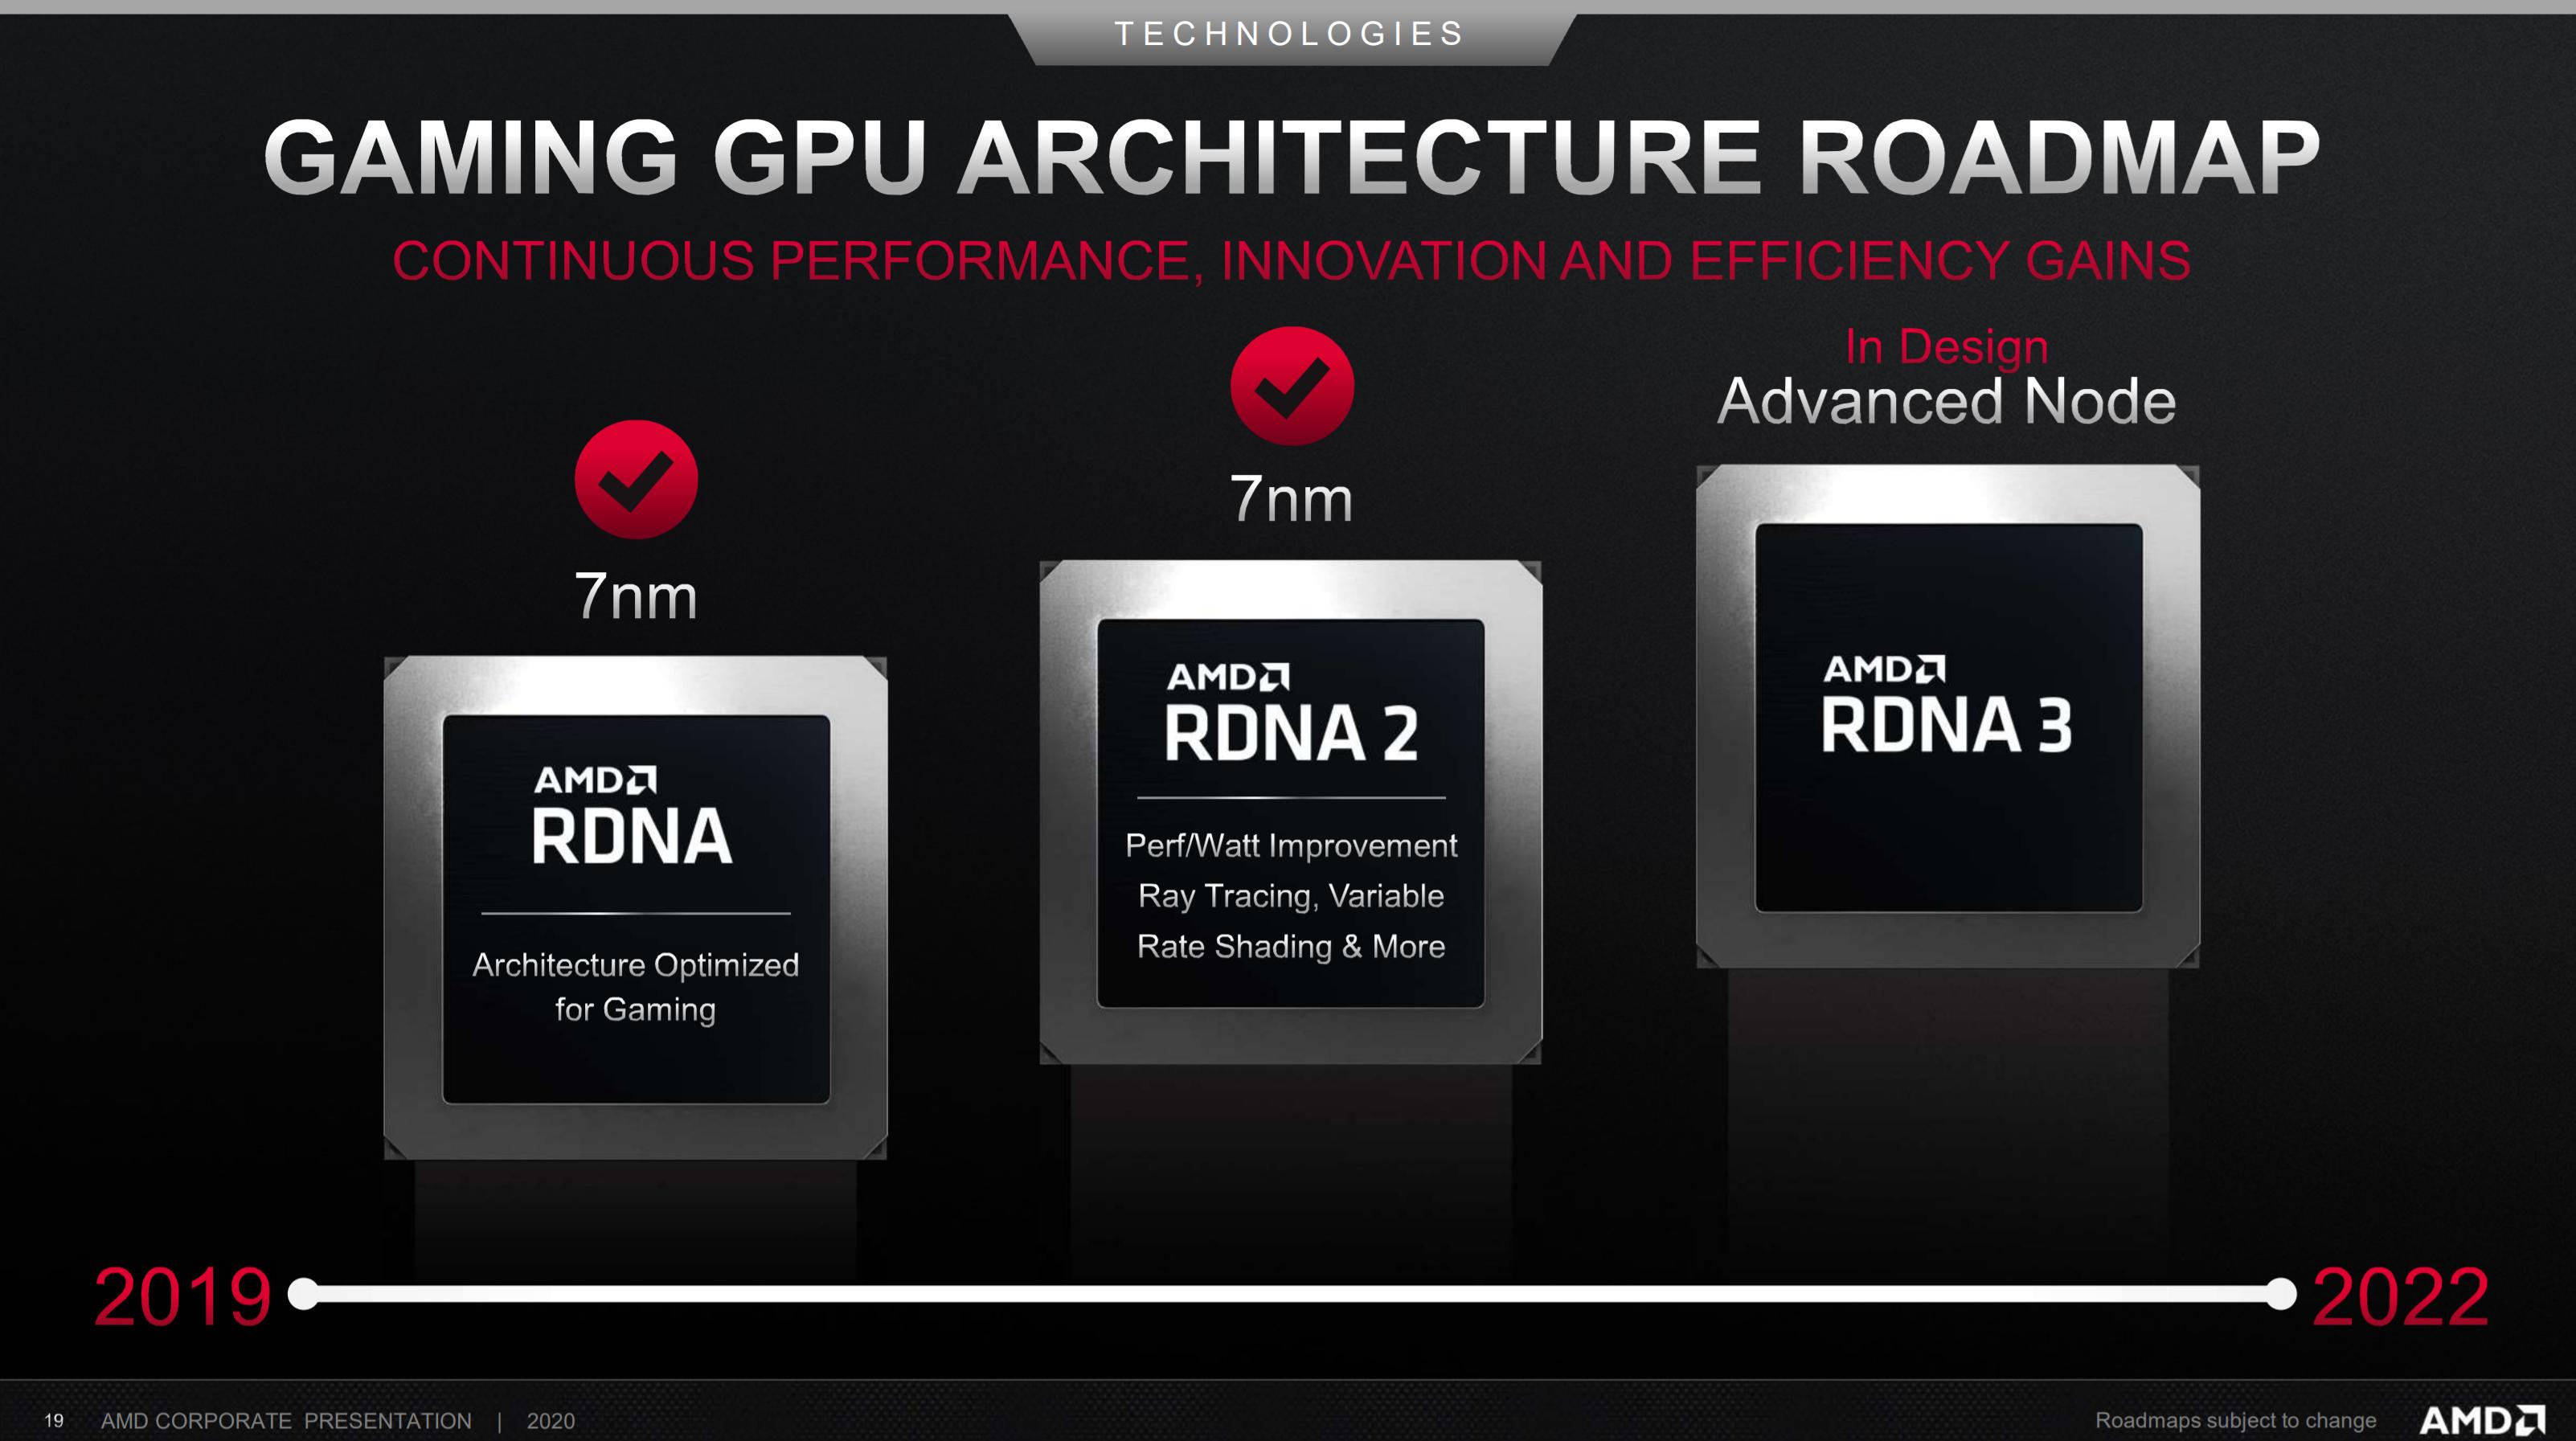 AMD RDNA 3